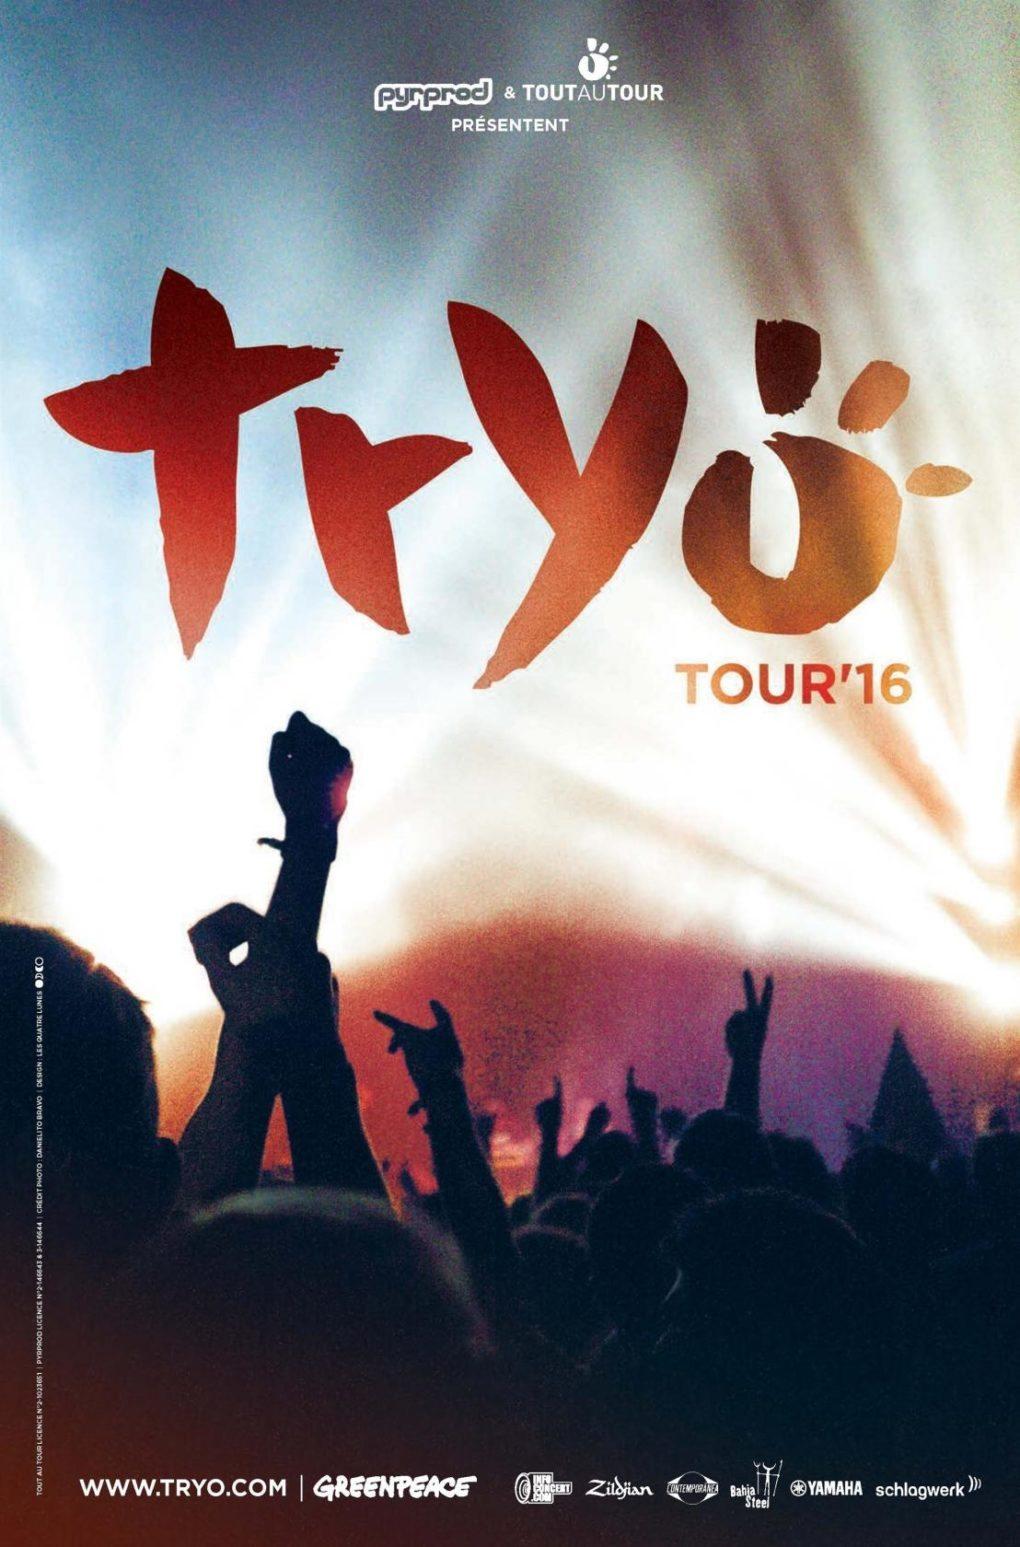 Tryo Nantes